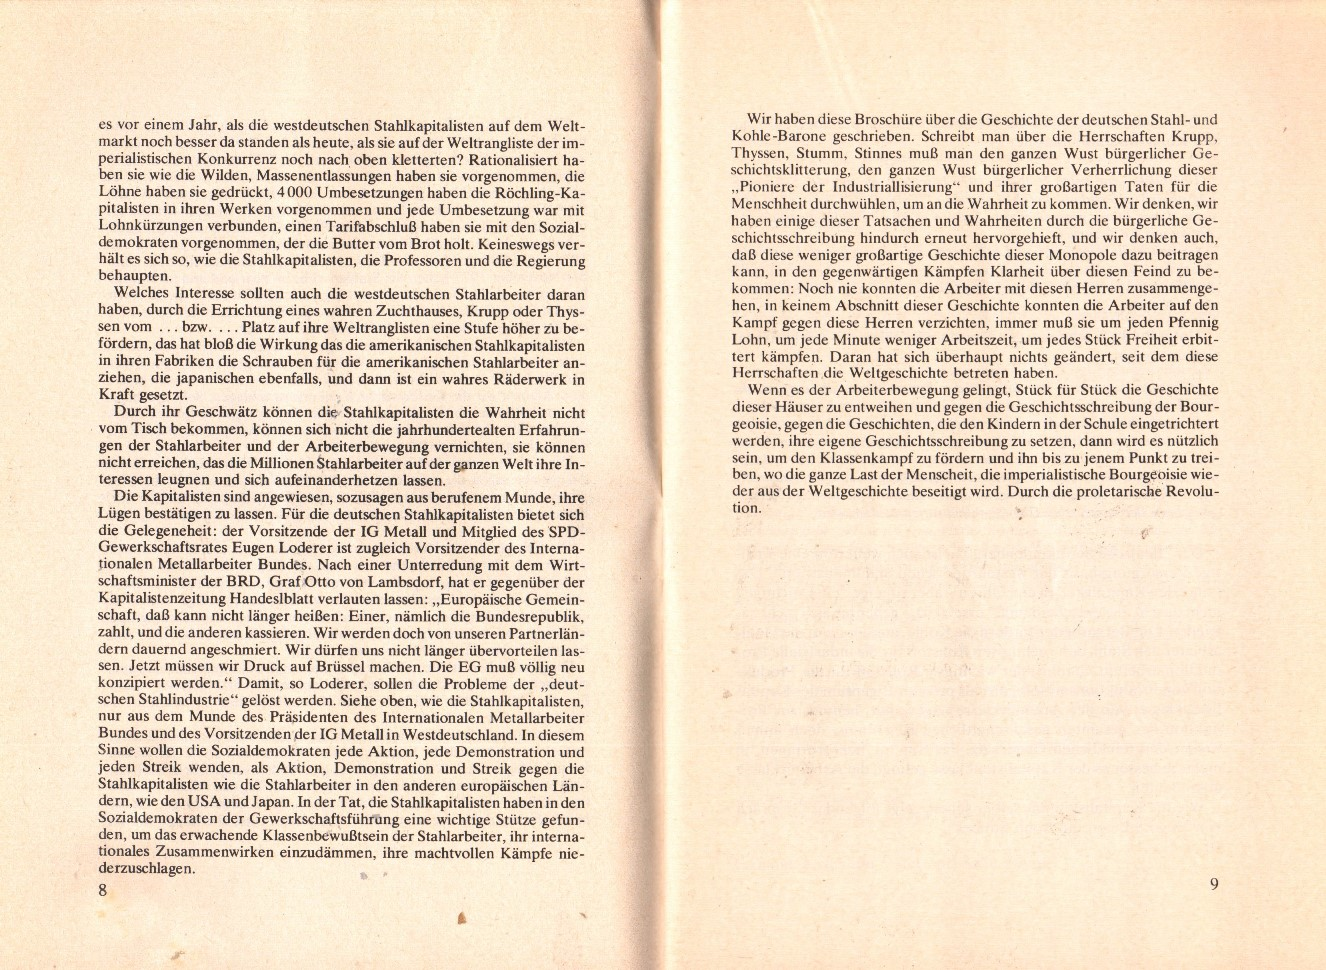 NRW_KBW_1977_Politik_der_Kohle_u_Stahlbarone_05